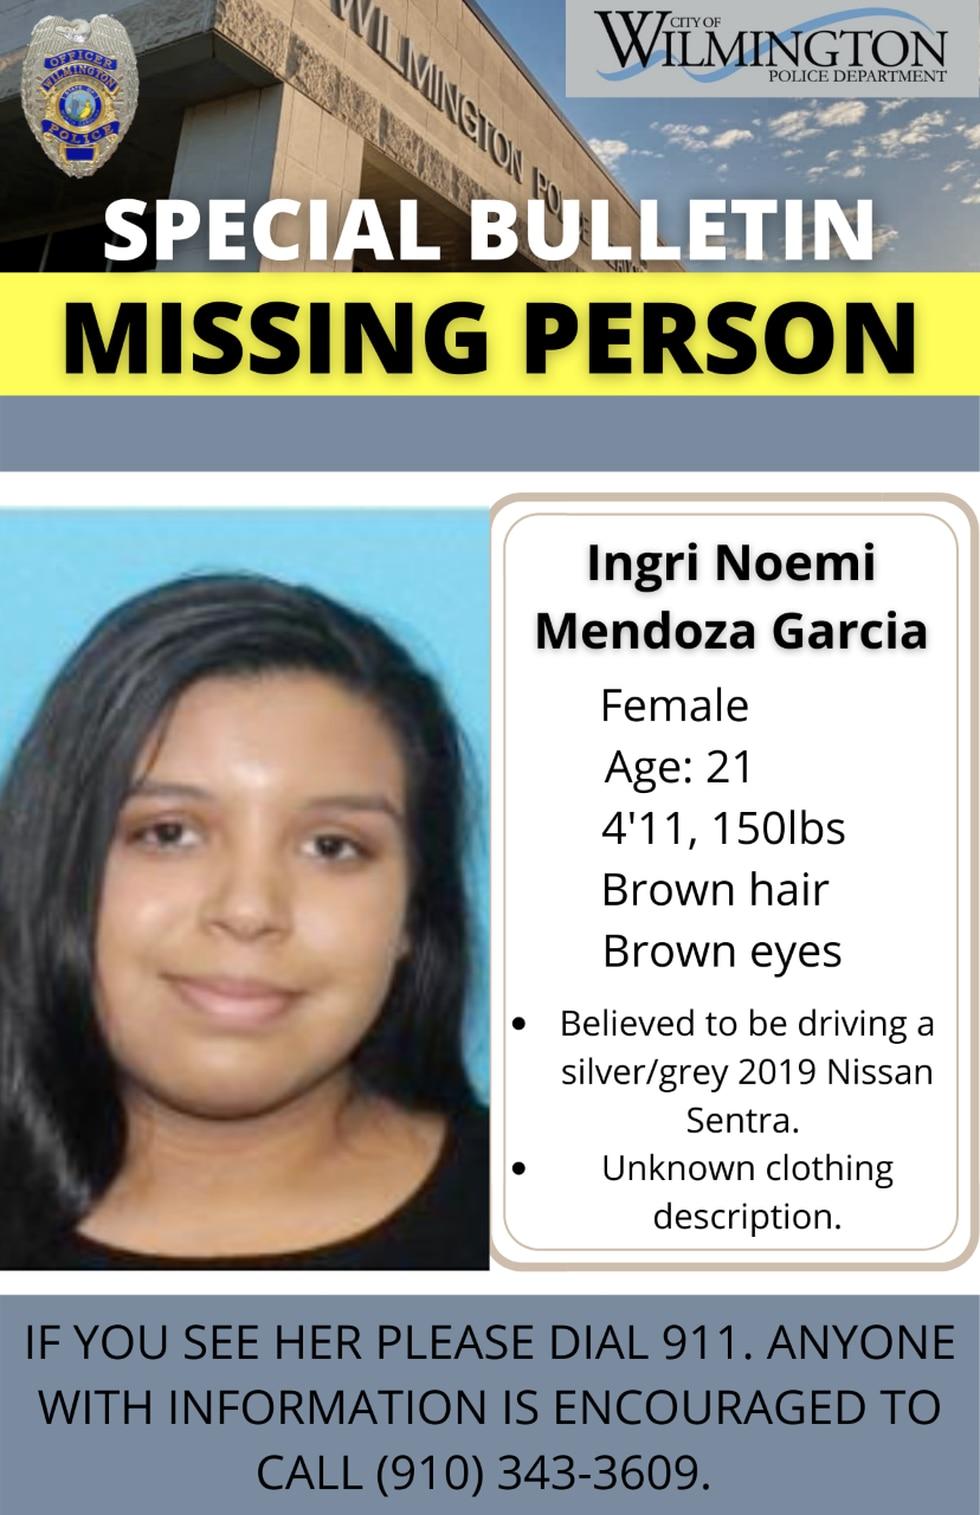 Missing person: Ingri Noemi Mendoza Garcia